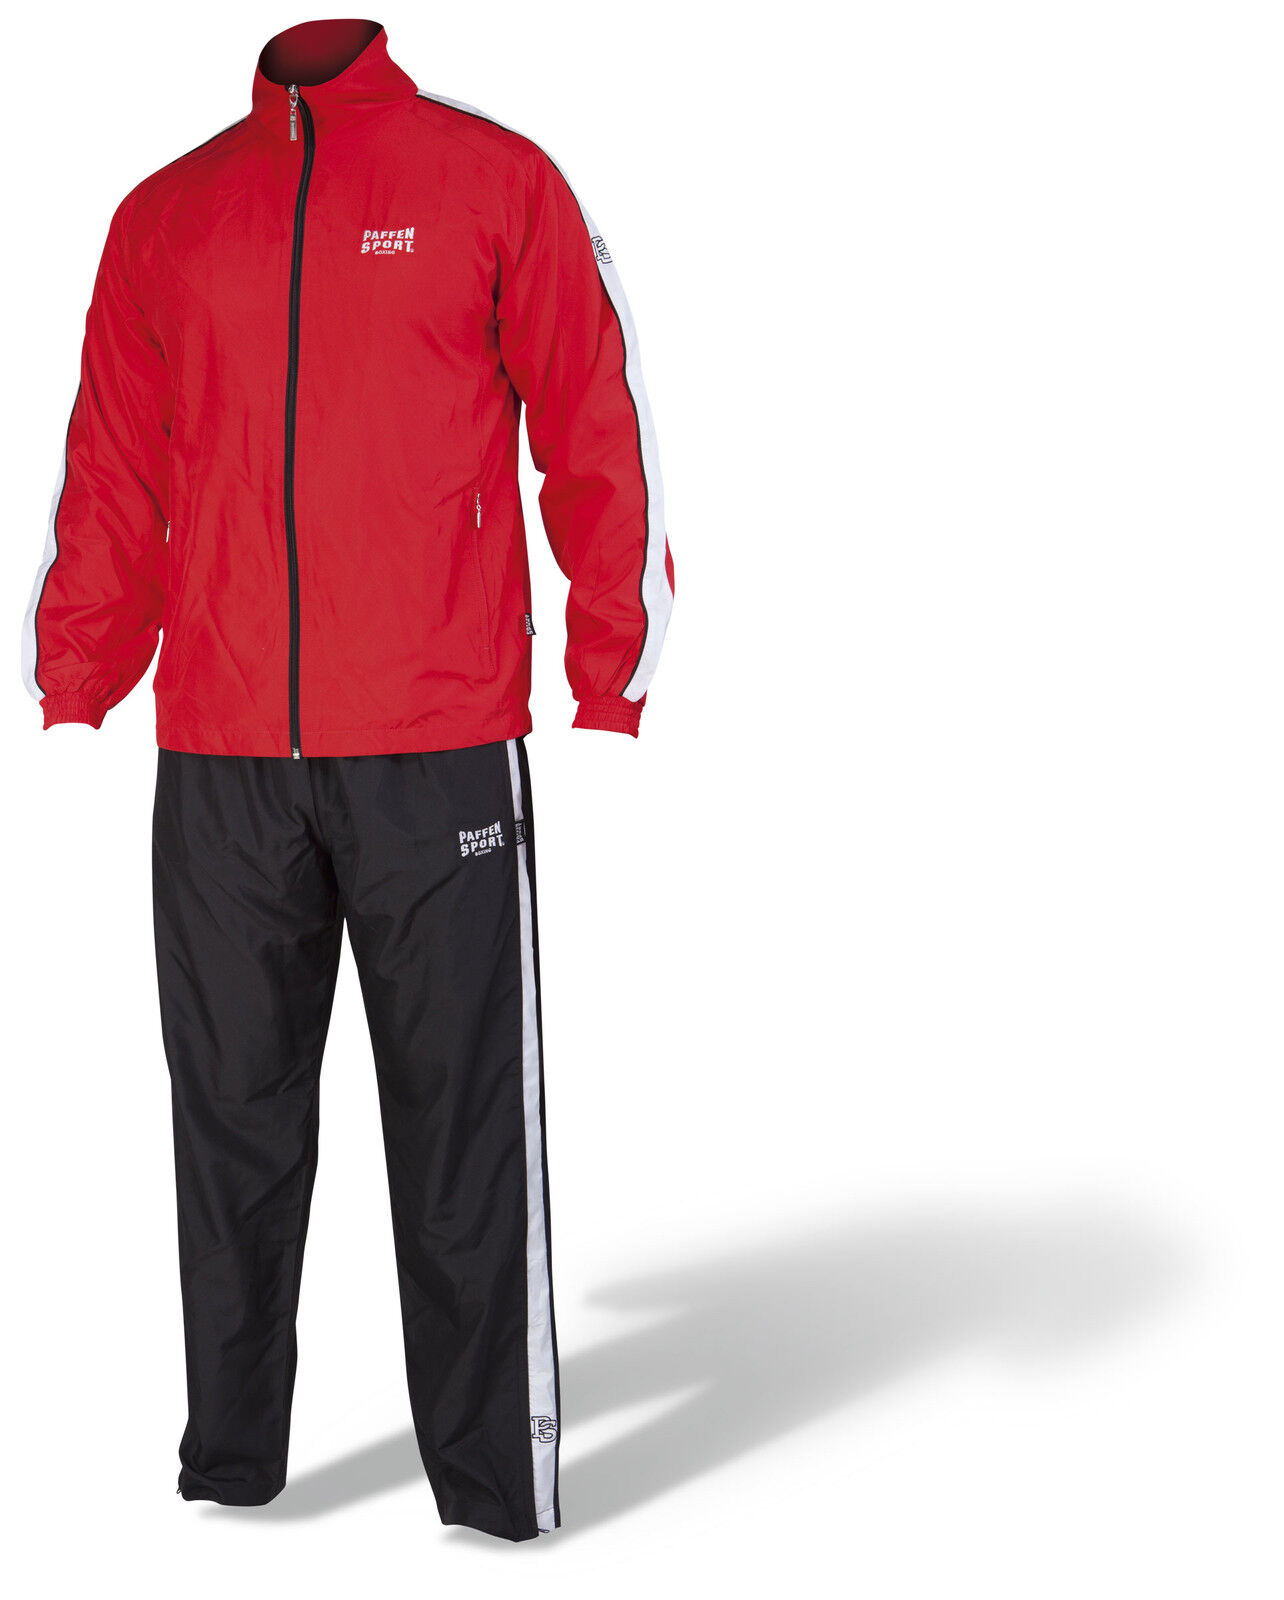 Paffen Sport Team II Trainingsanzug. Rot. 100% Polyester. Boxen. Kickboxen, MMA